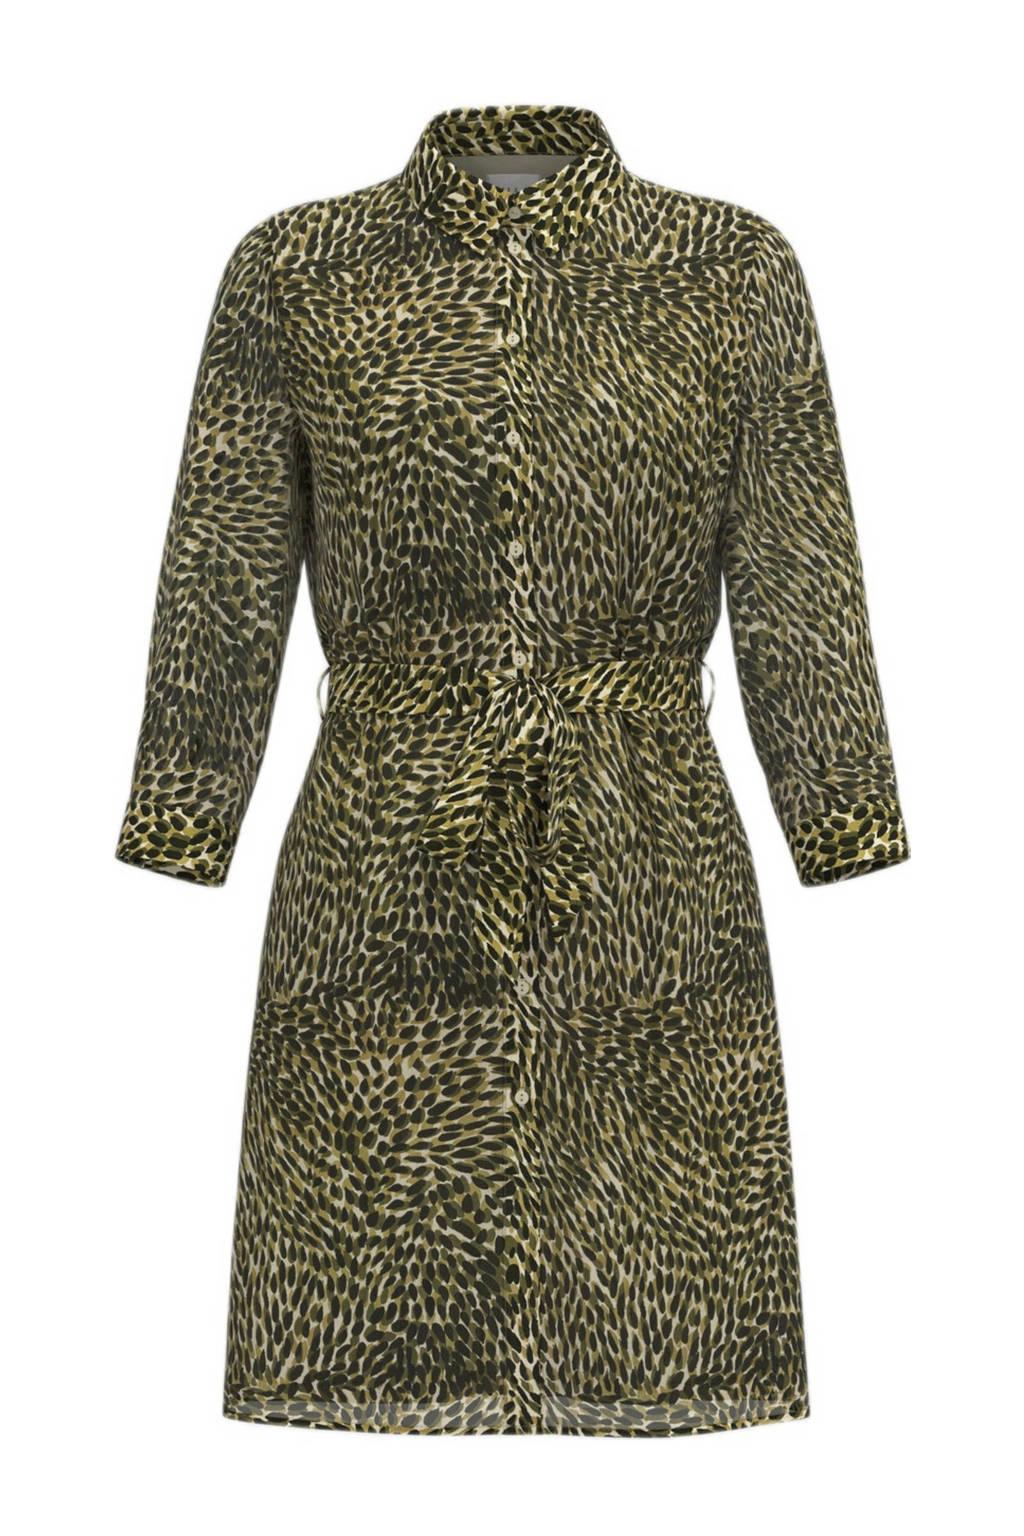 VILA blousejurk VIFULLA van gerecycled polyester groen/kaki/zwart, Groen/Kaki/Zwart